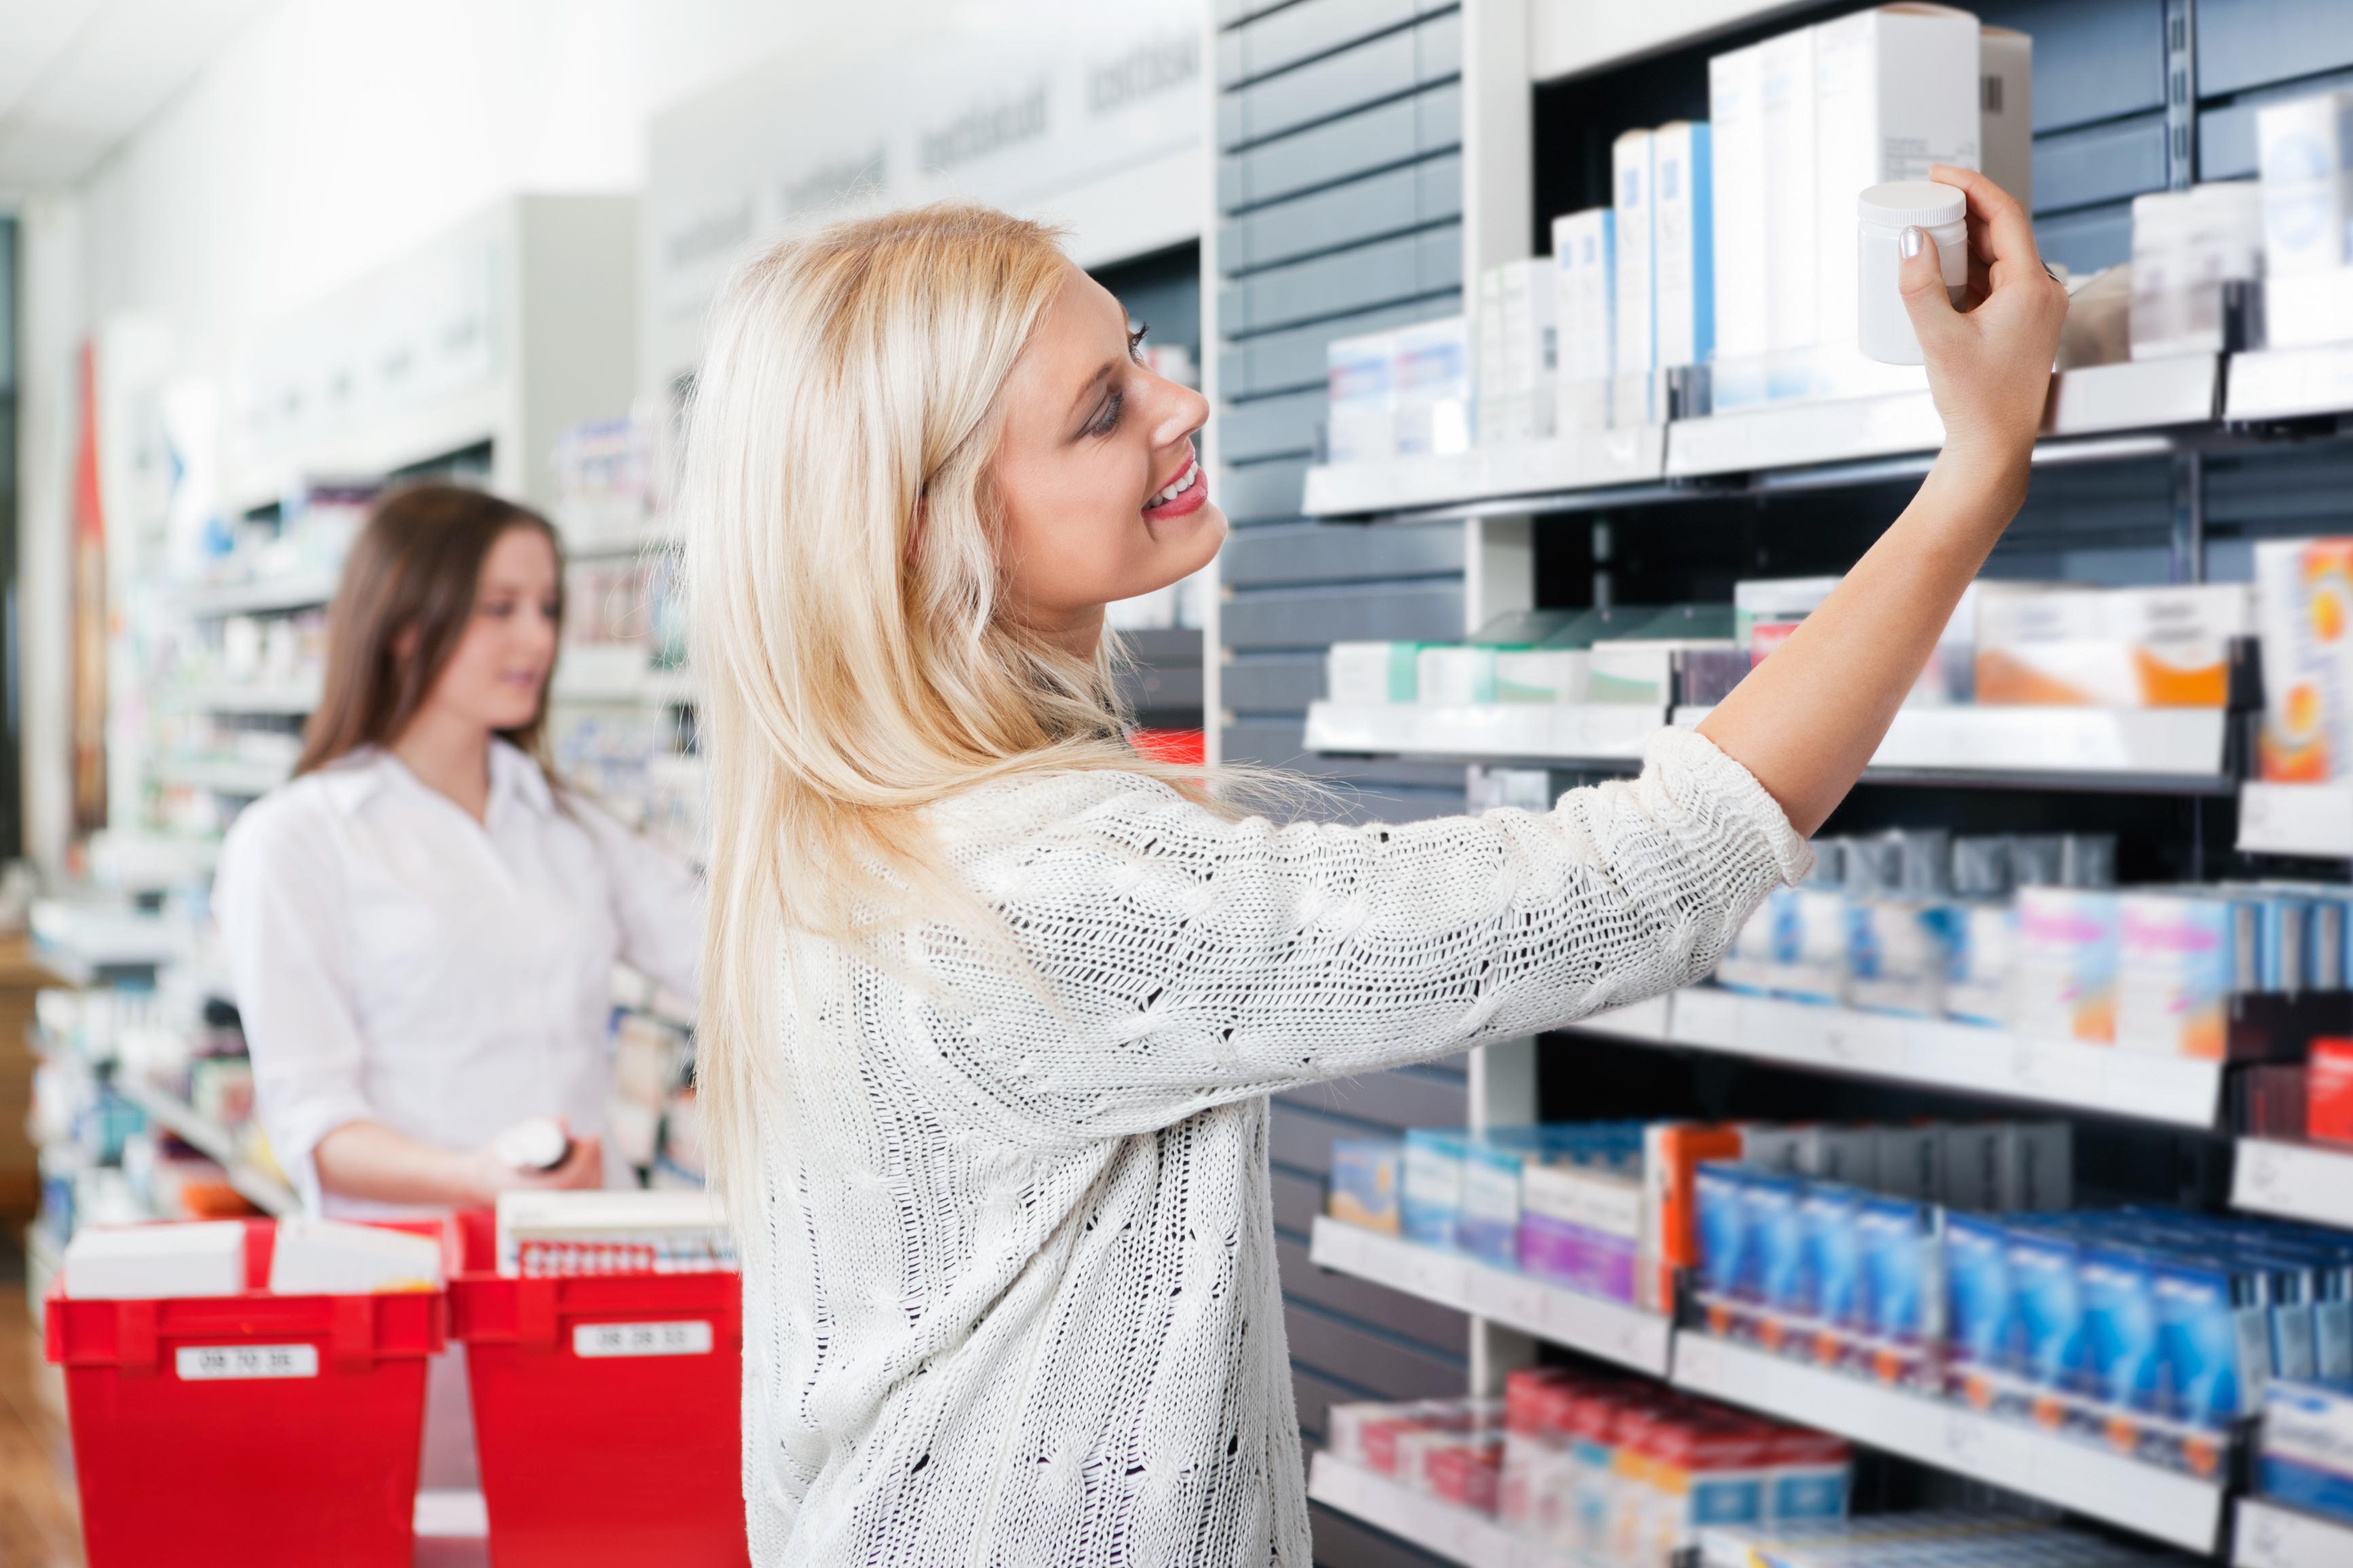 Welcome to Caloosa Pharmacy